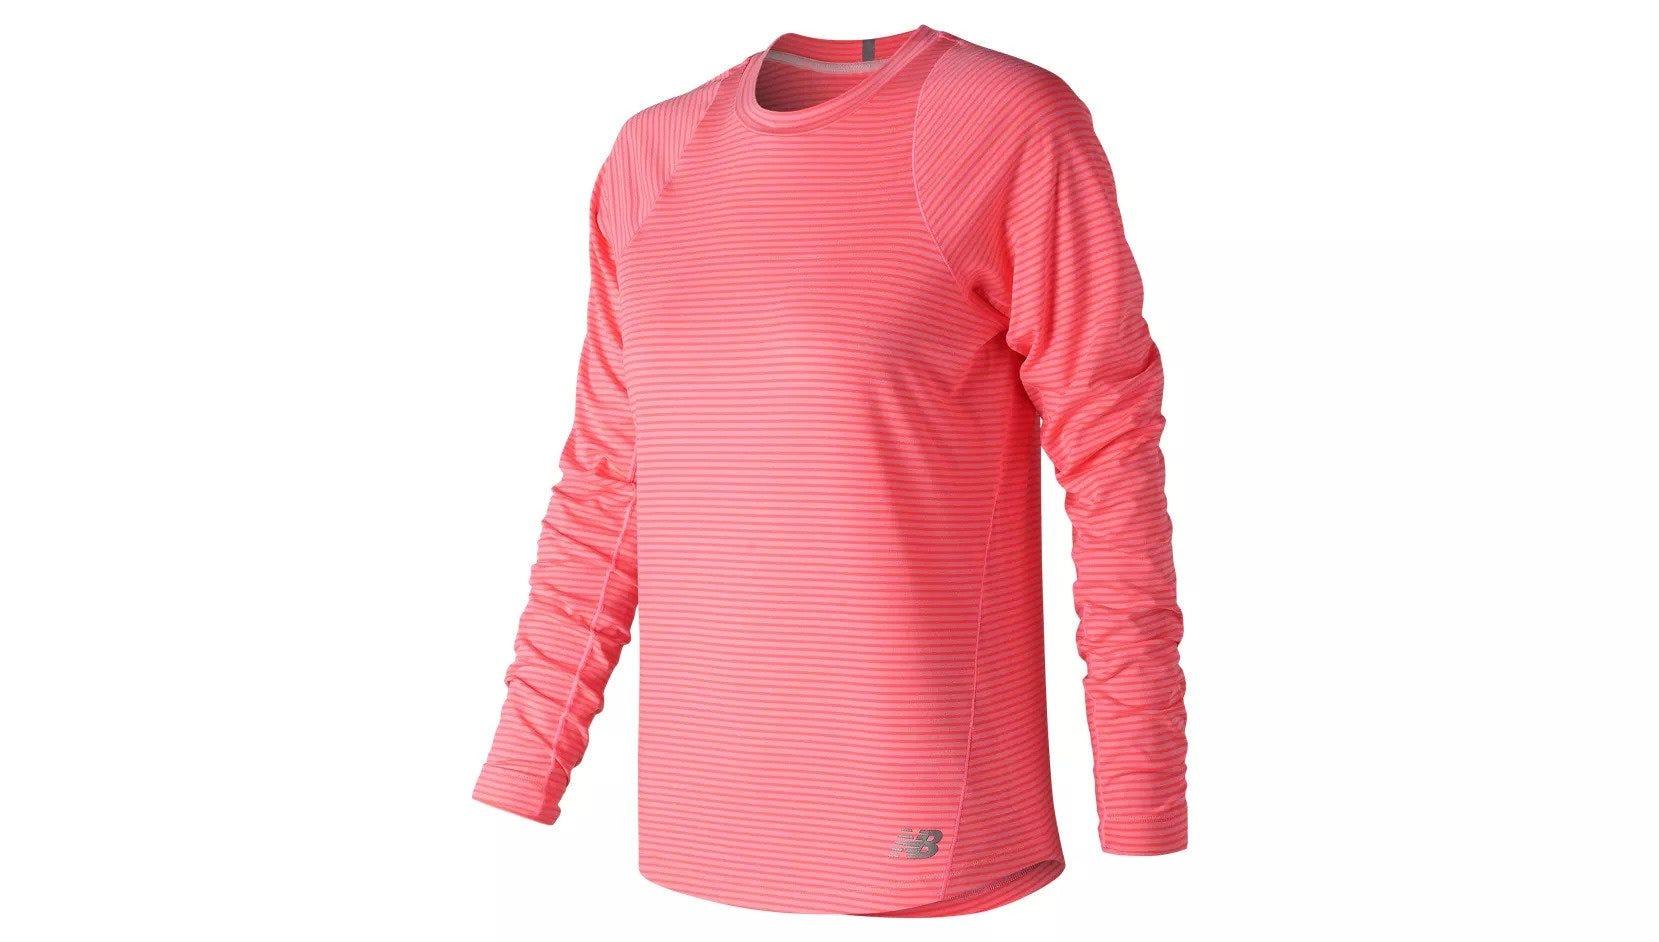 5ecc51d8 Best Long Sleeve Workout Shirts For Women To Buy ASAP